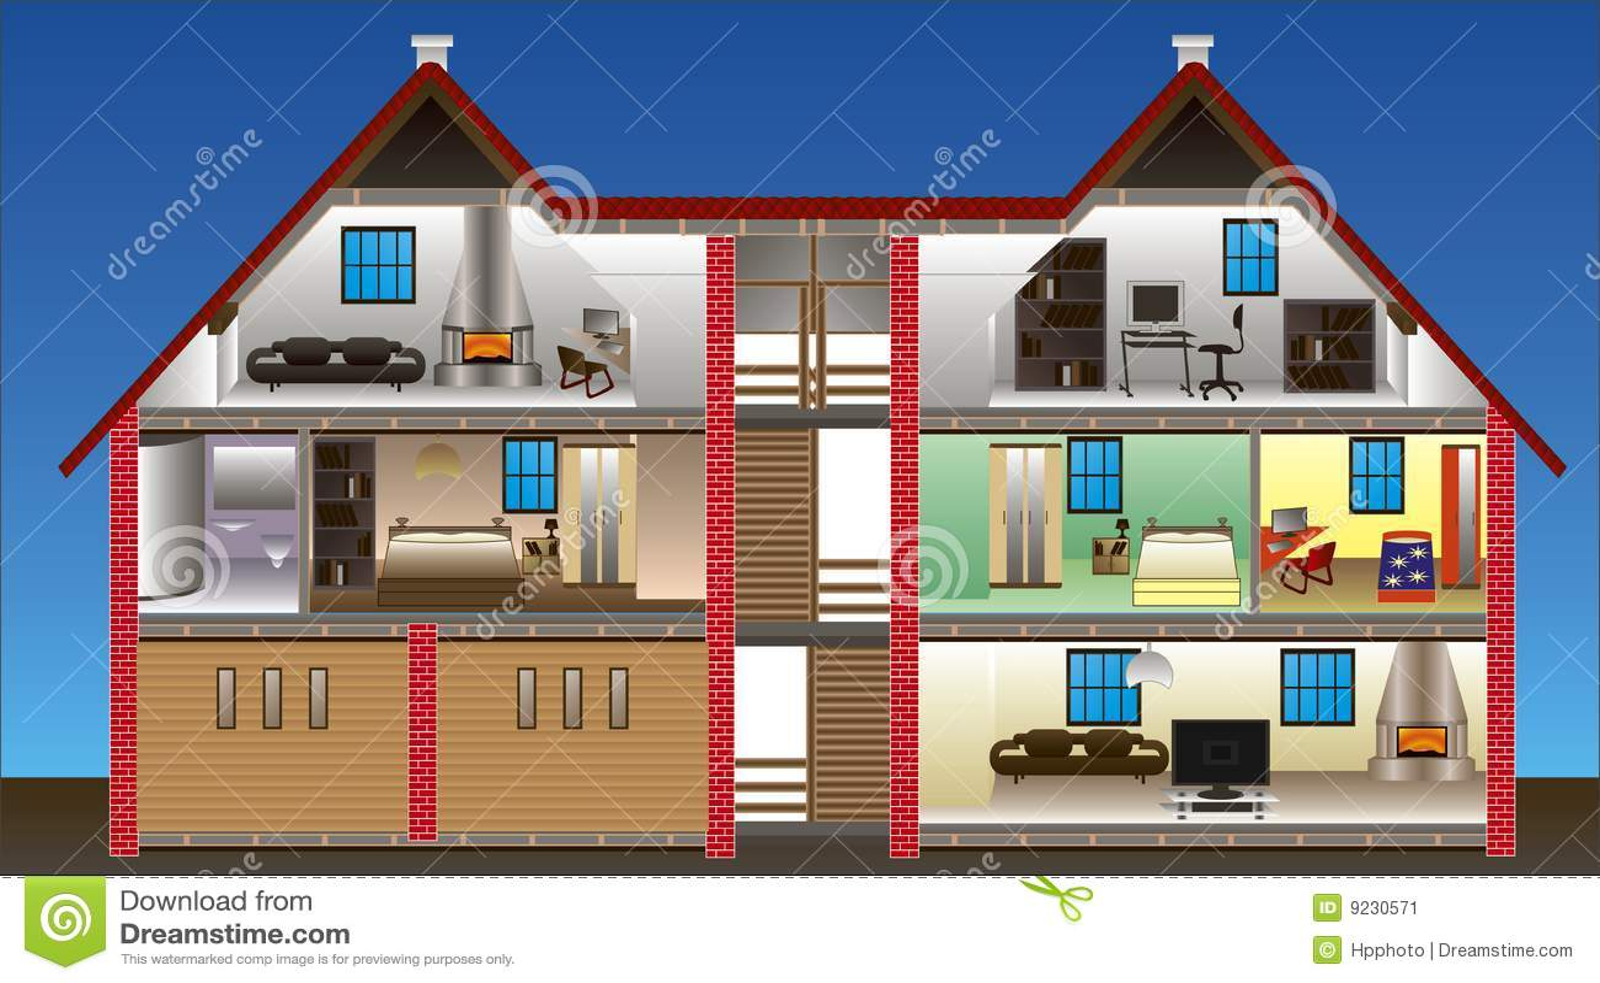 Stock Image Vector House Image9230571 on 2d Floor Plan Design